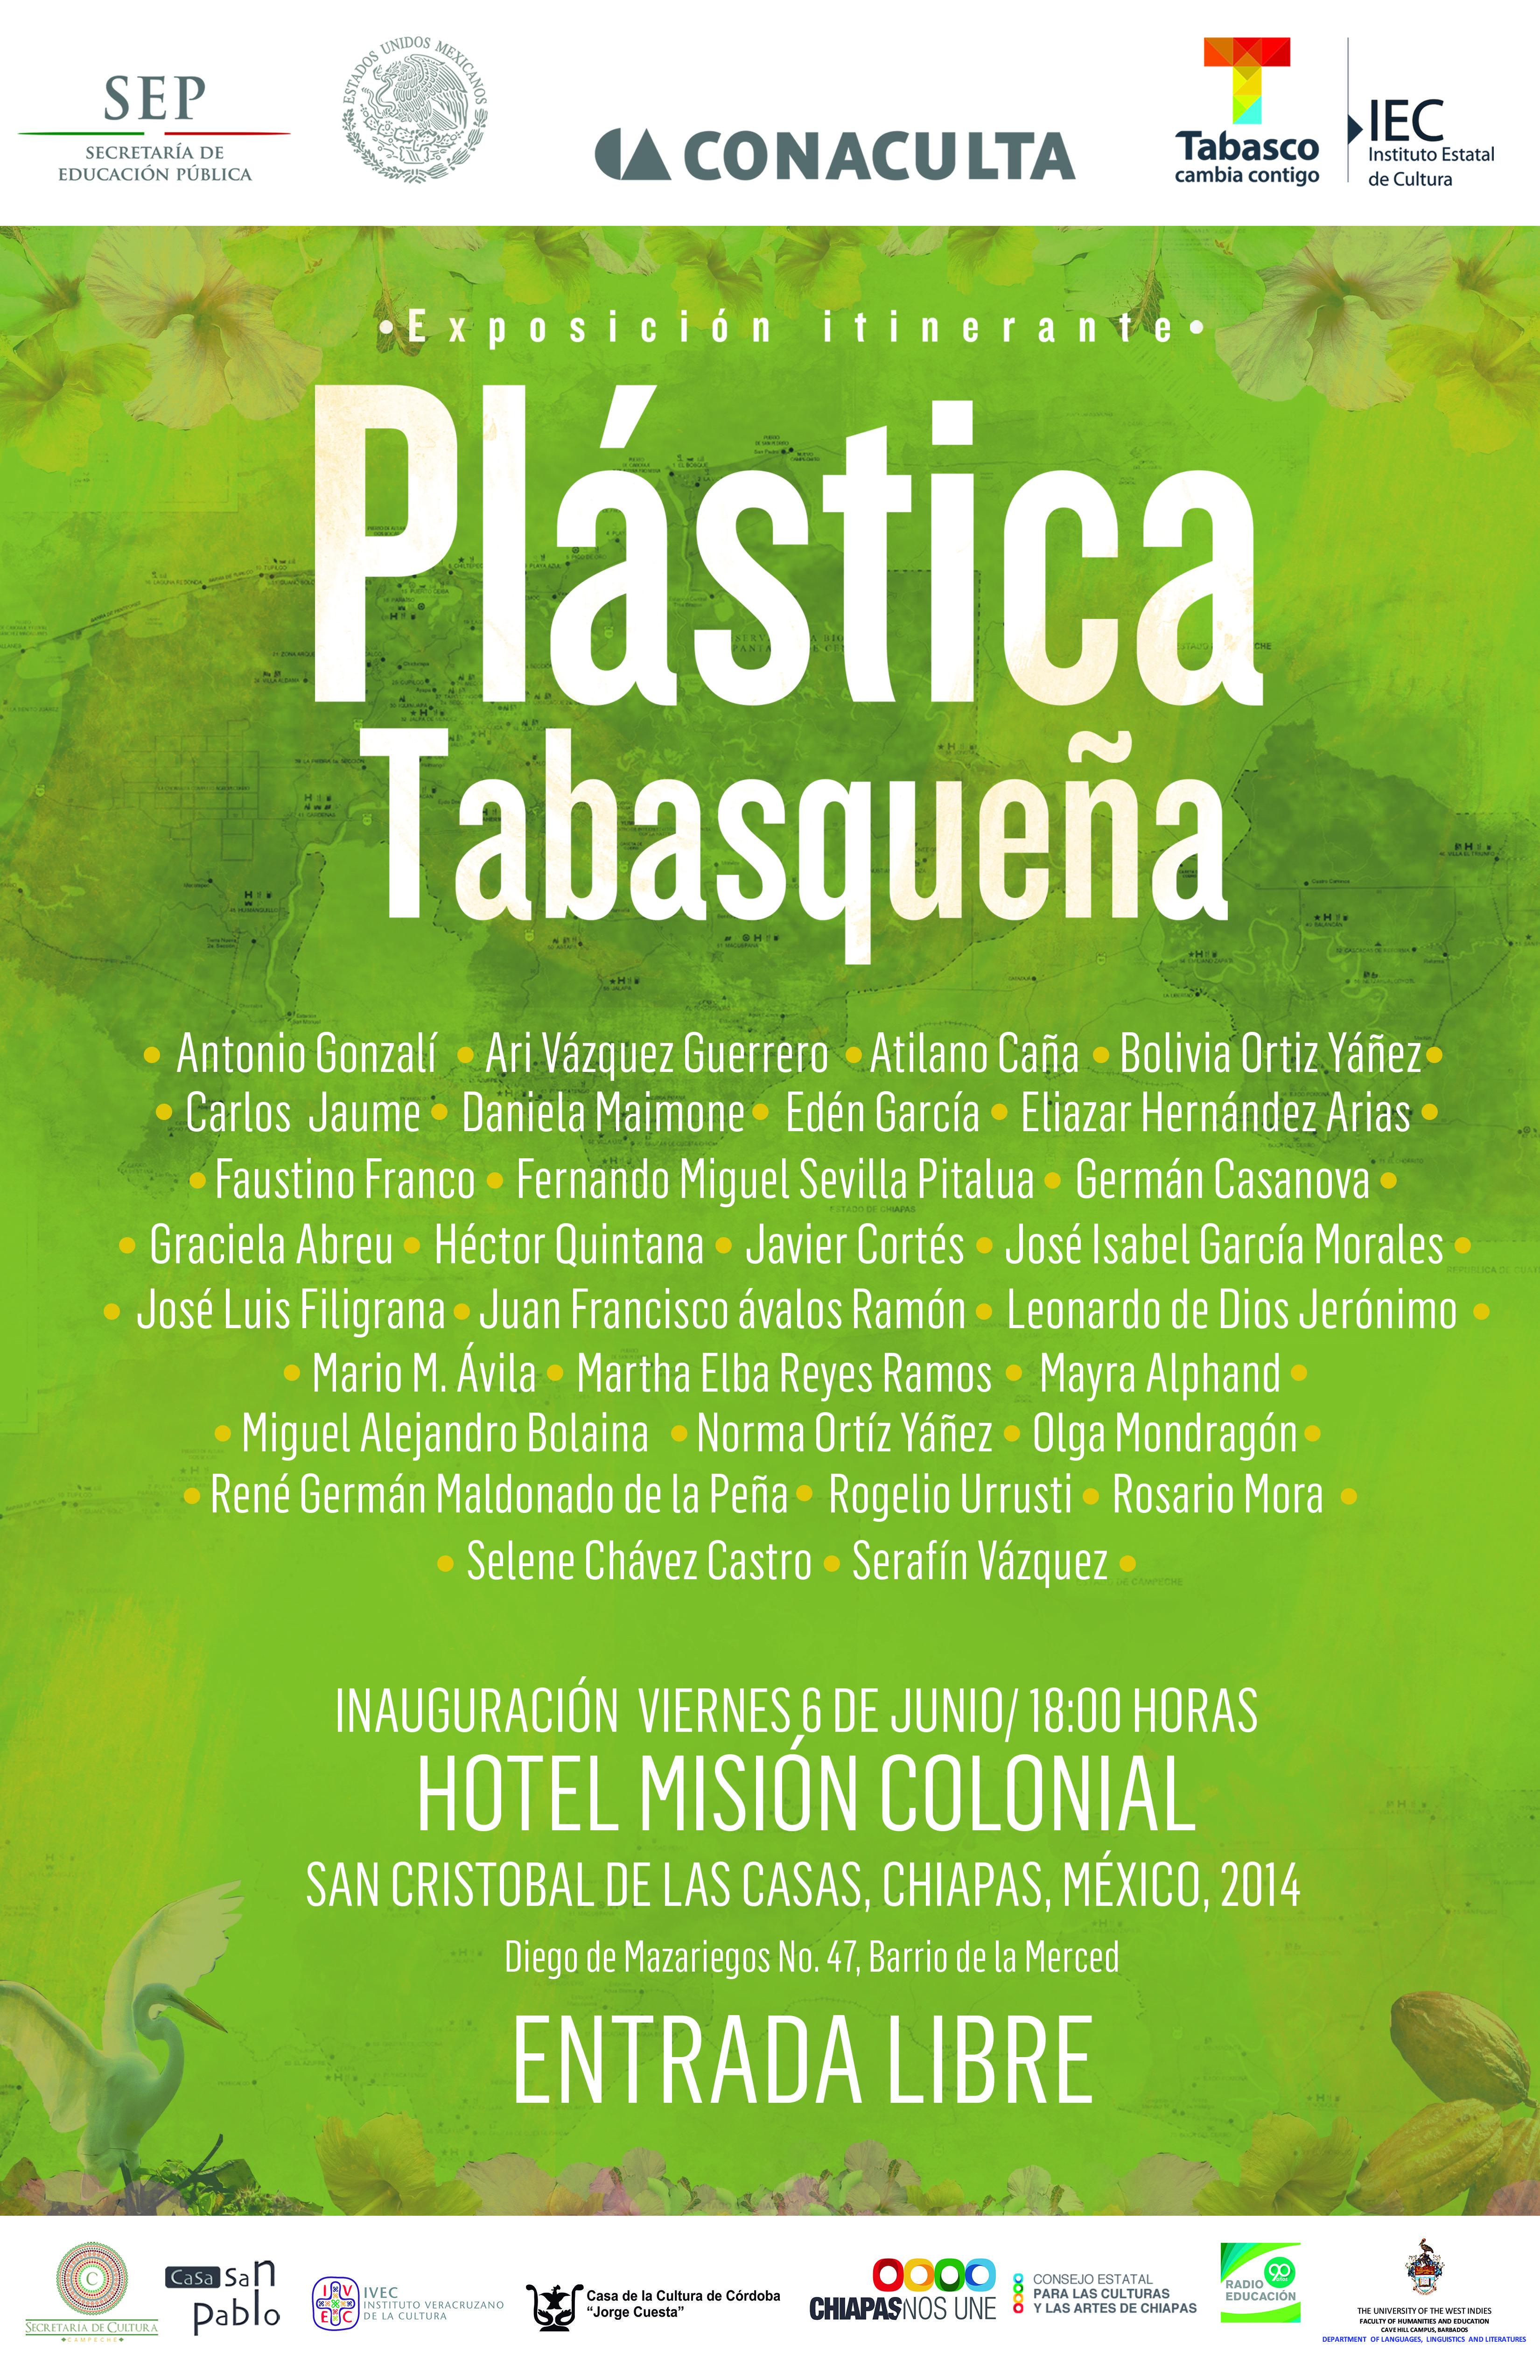 Exposición Itinerante Colectiva que reúne a los mejores pintores de Tabasco.